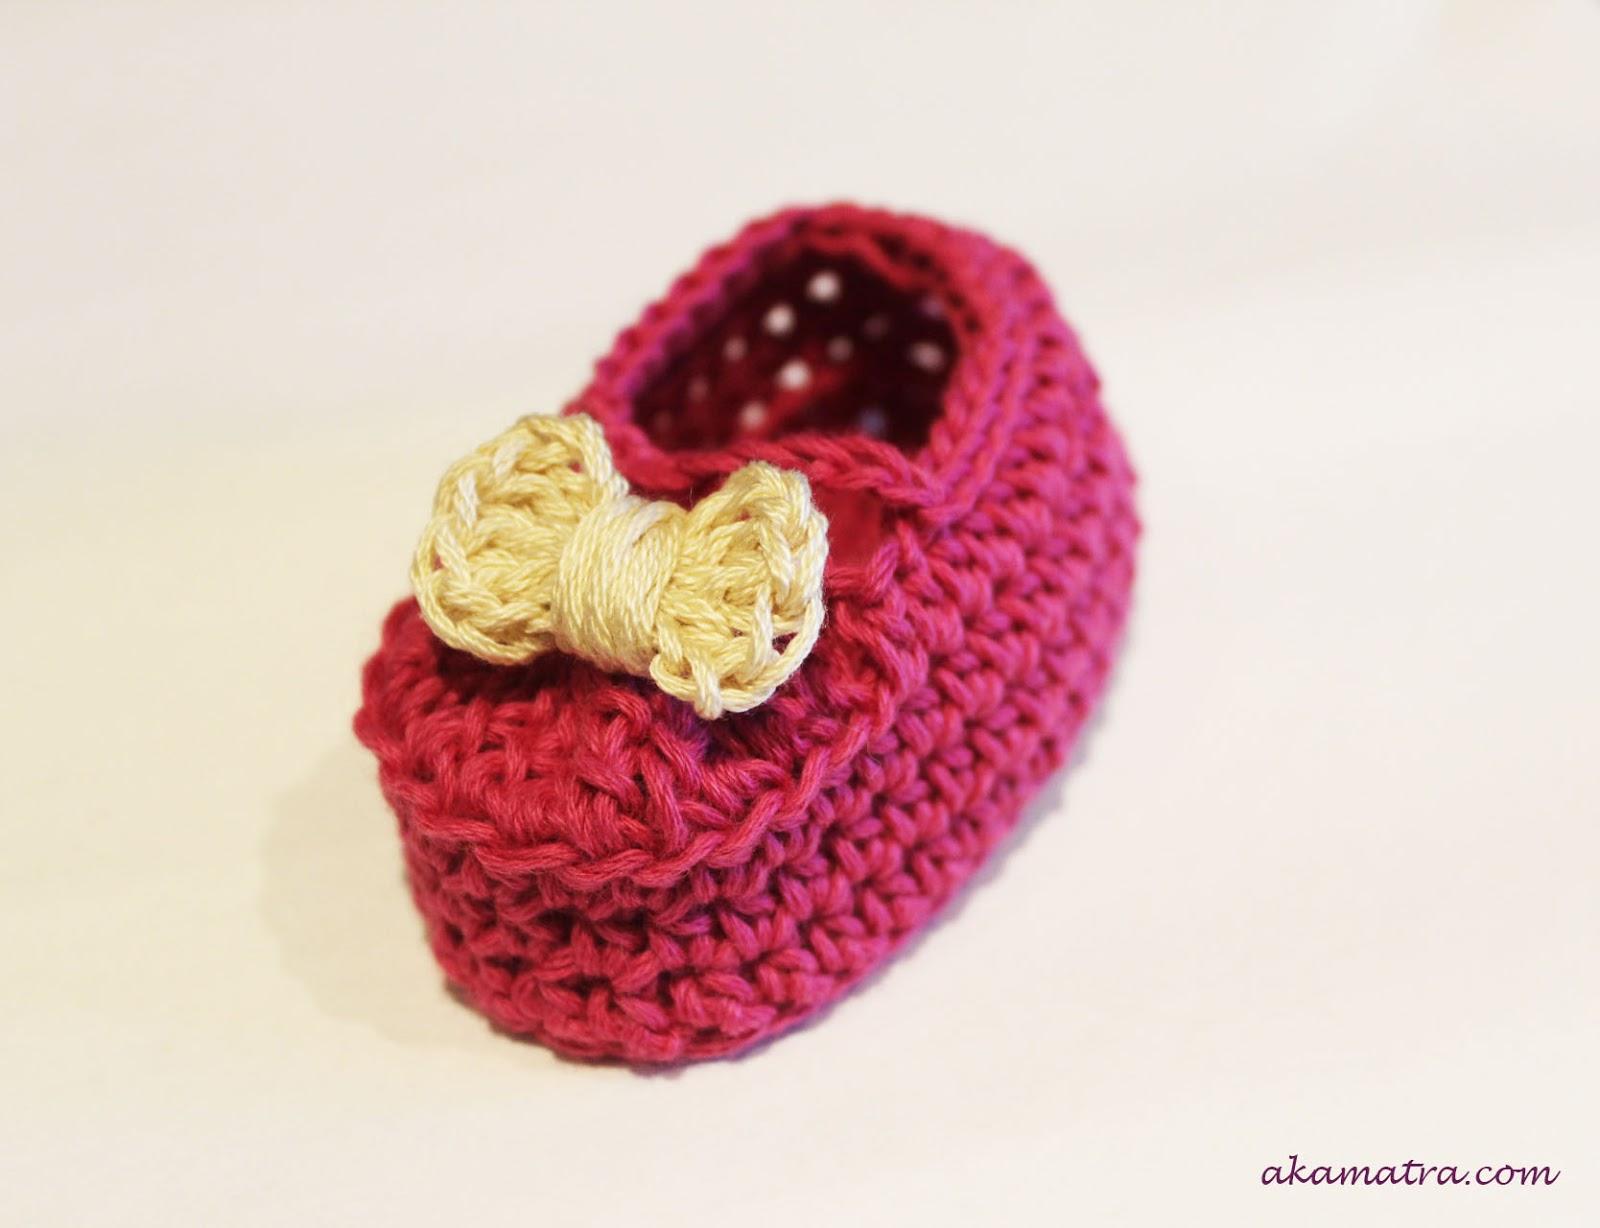 Baby shoes crochet pattern Akamatra